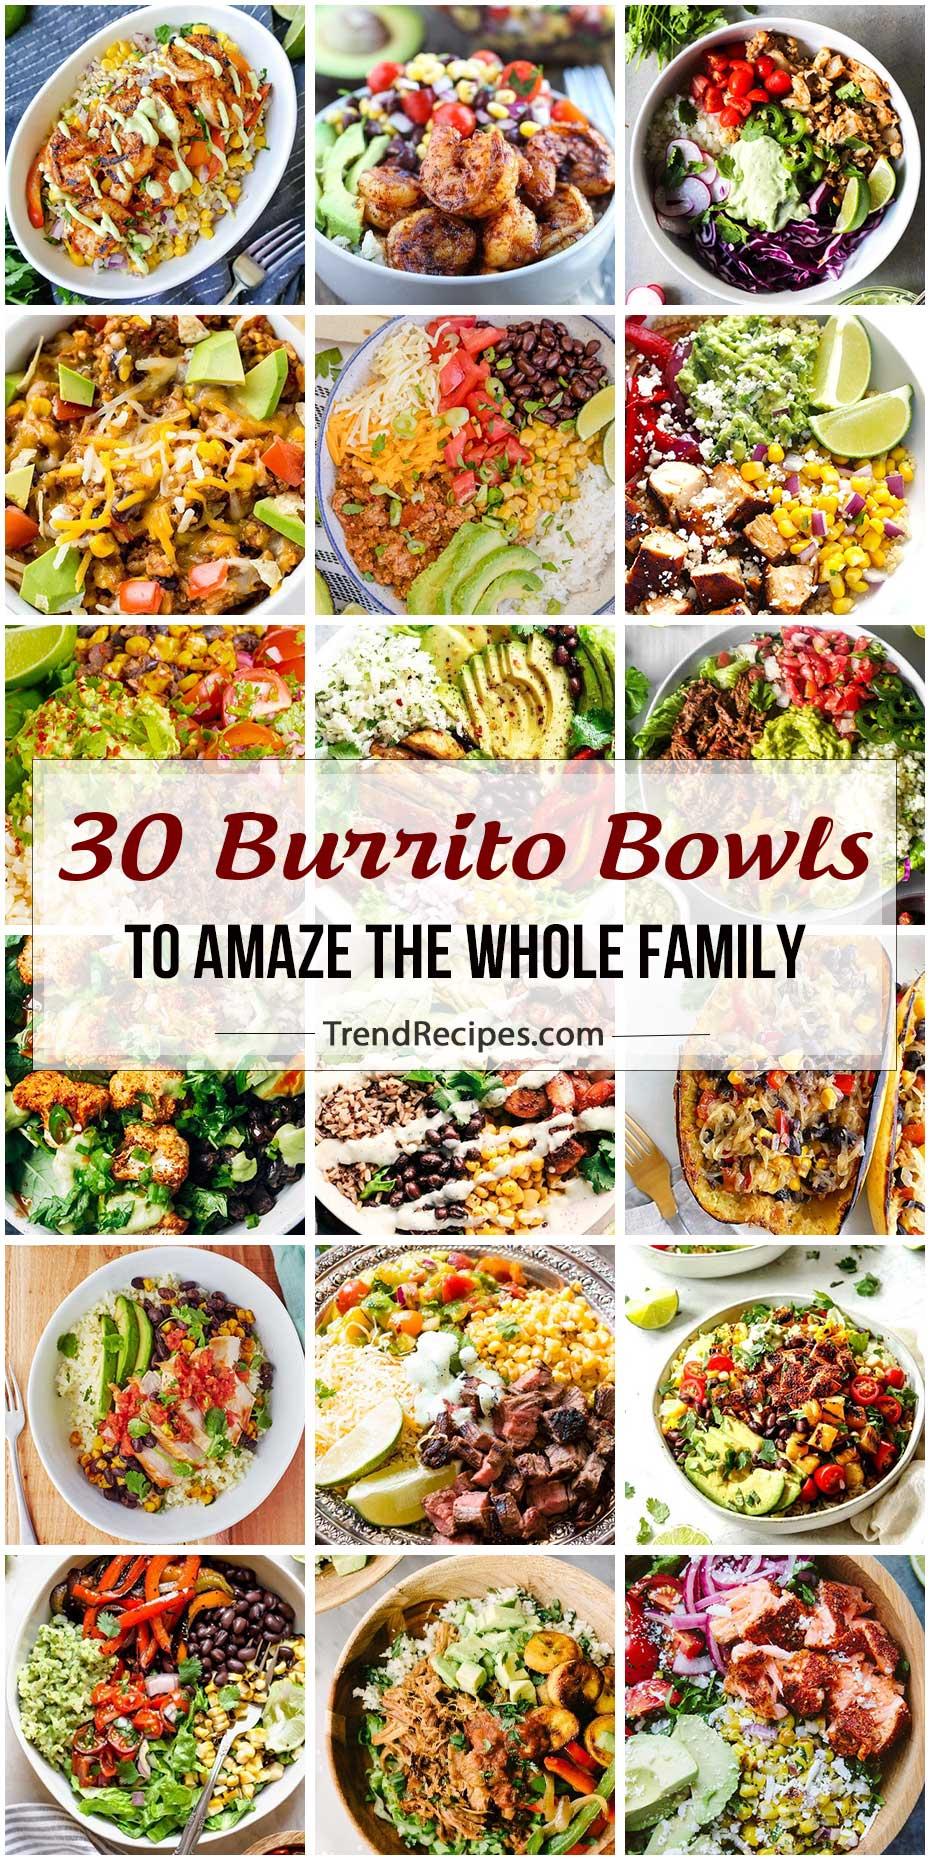 30 Burrito Bowls To Amaze The Whole Family